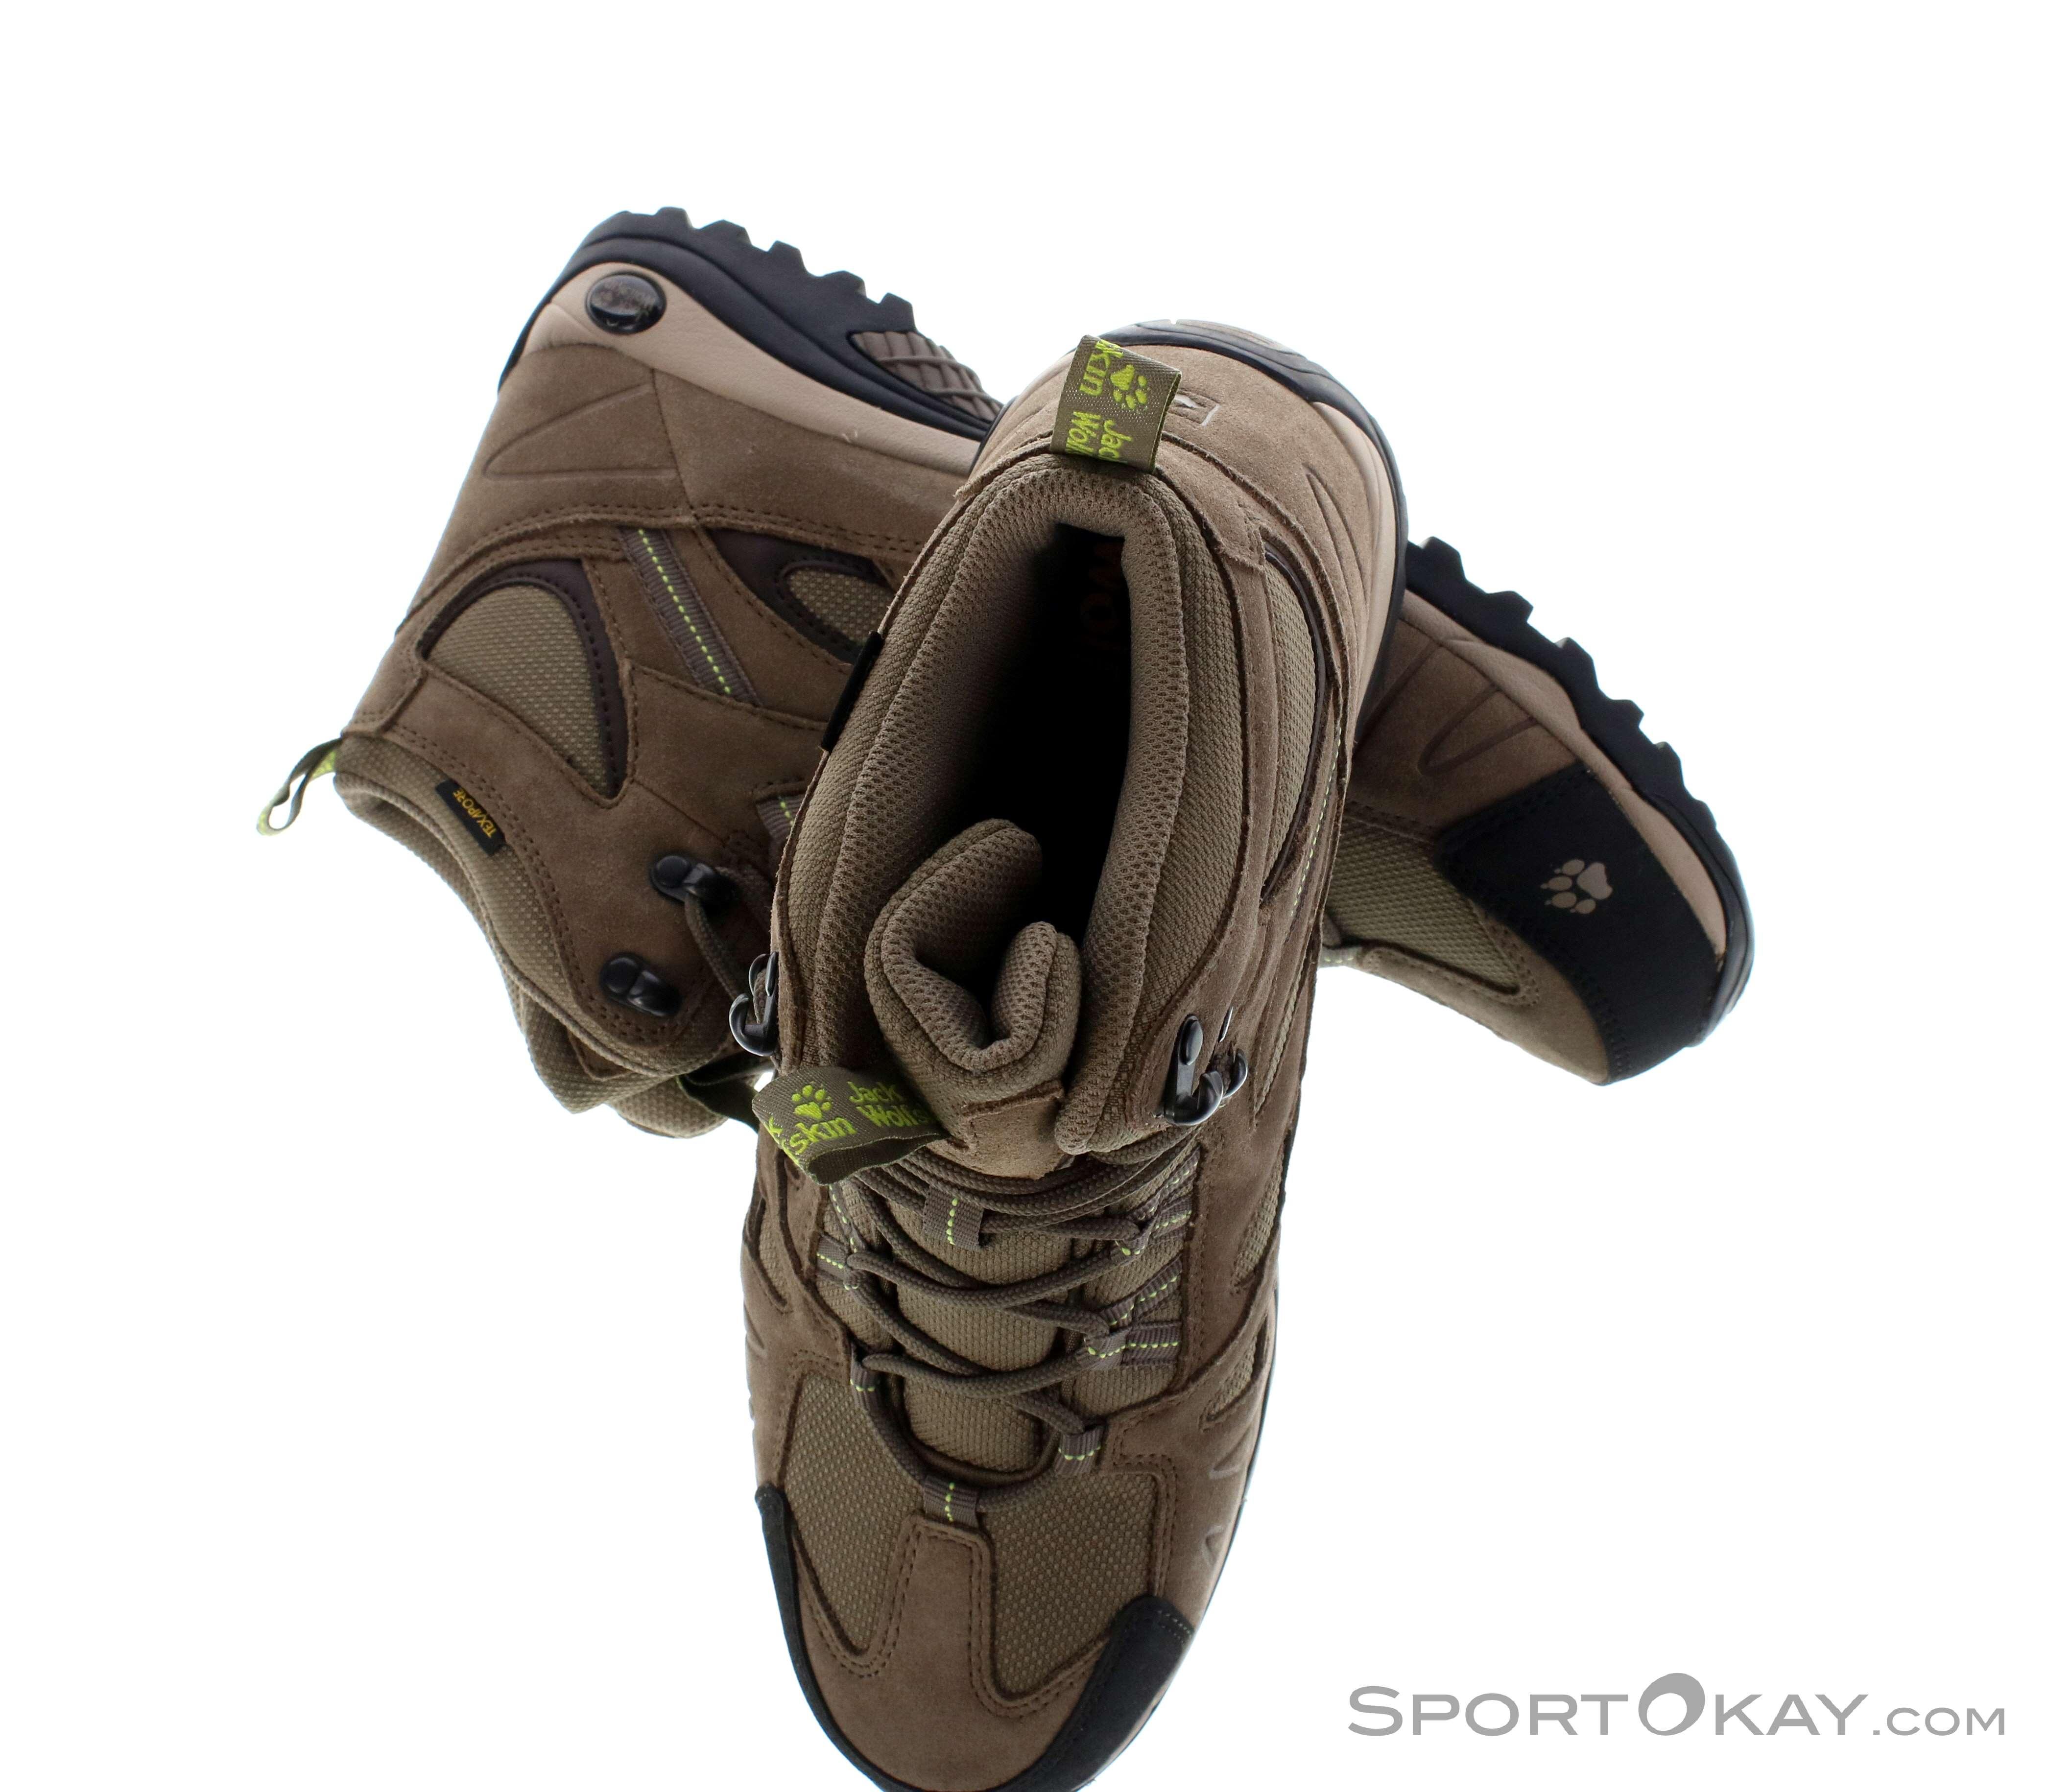 Mid Boots Texapore Womens Jack Wolfskin Hiking Hike Vojo N8wm0n